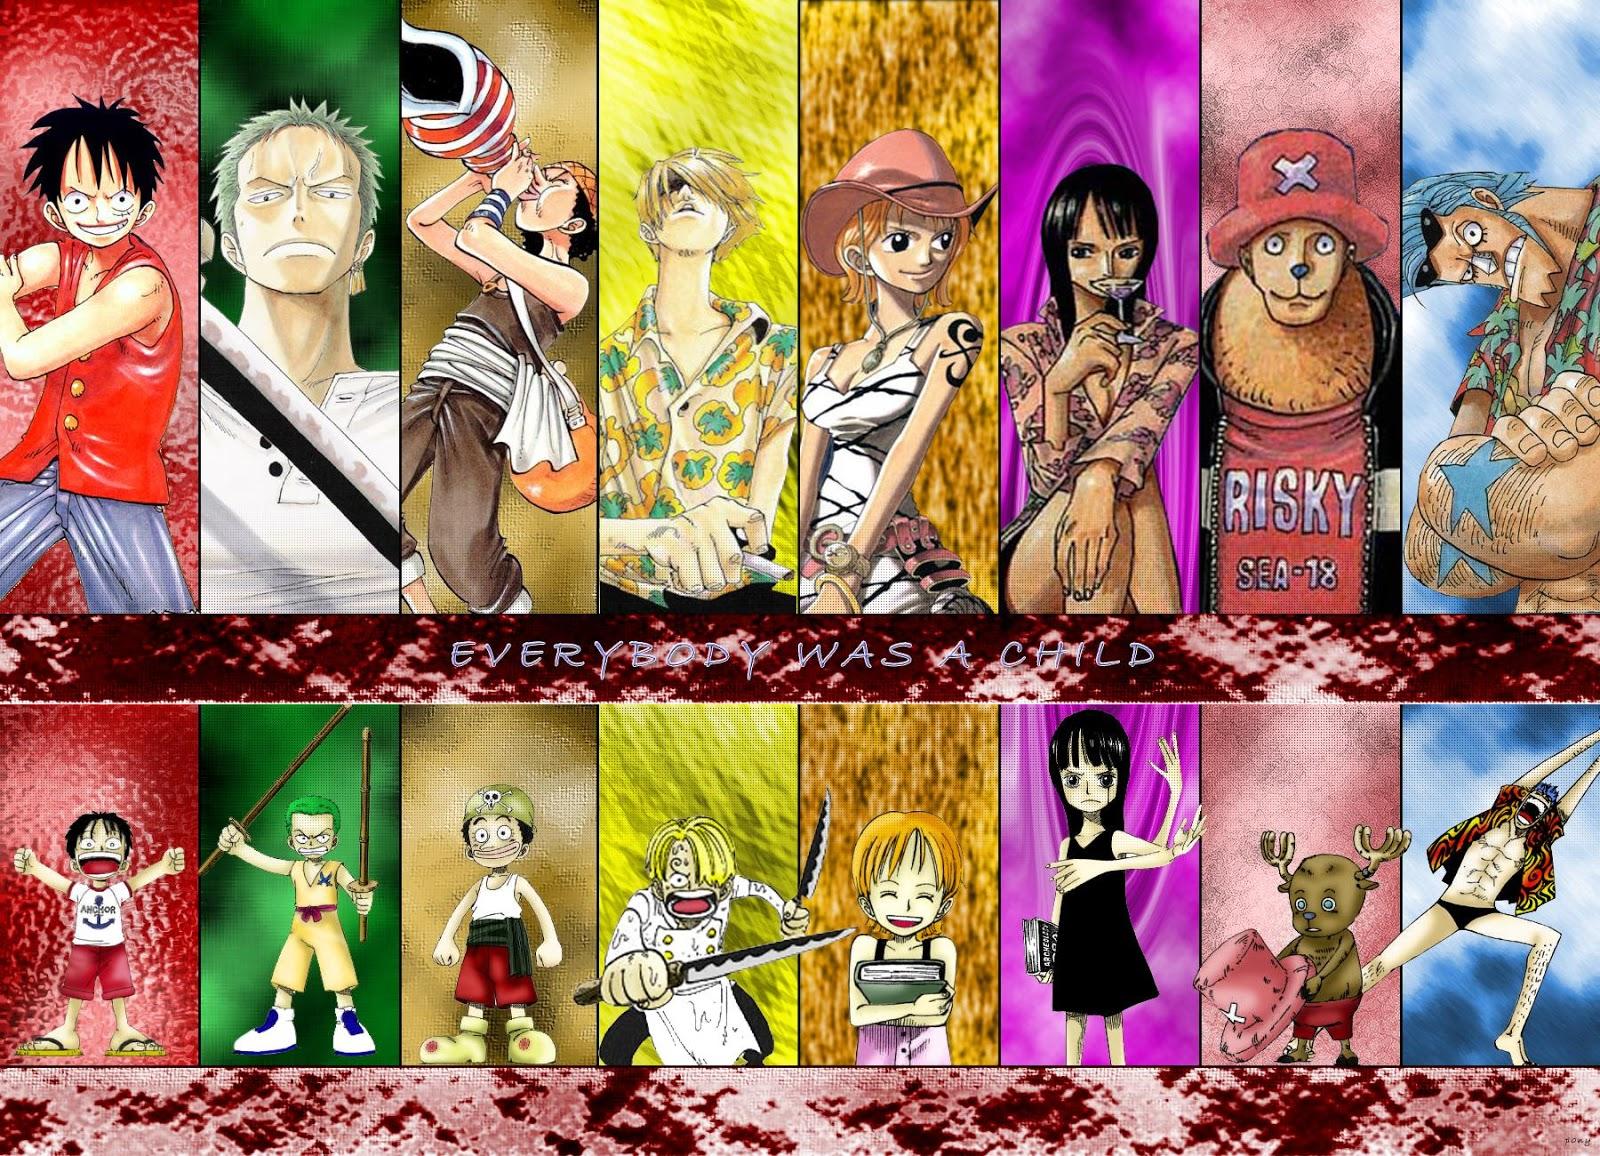 Wallpaper keren one piece hd koleksi gambar hd - Foto anime keren hd ...